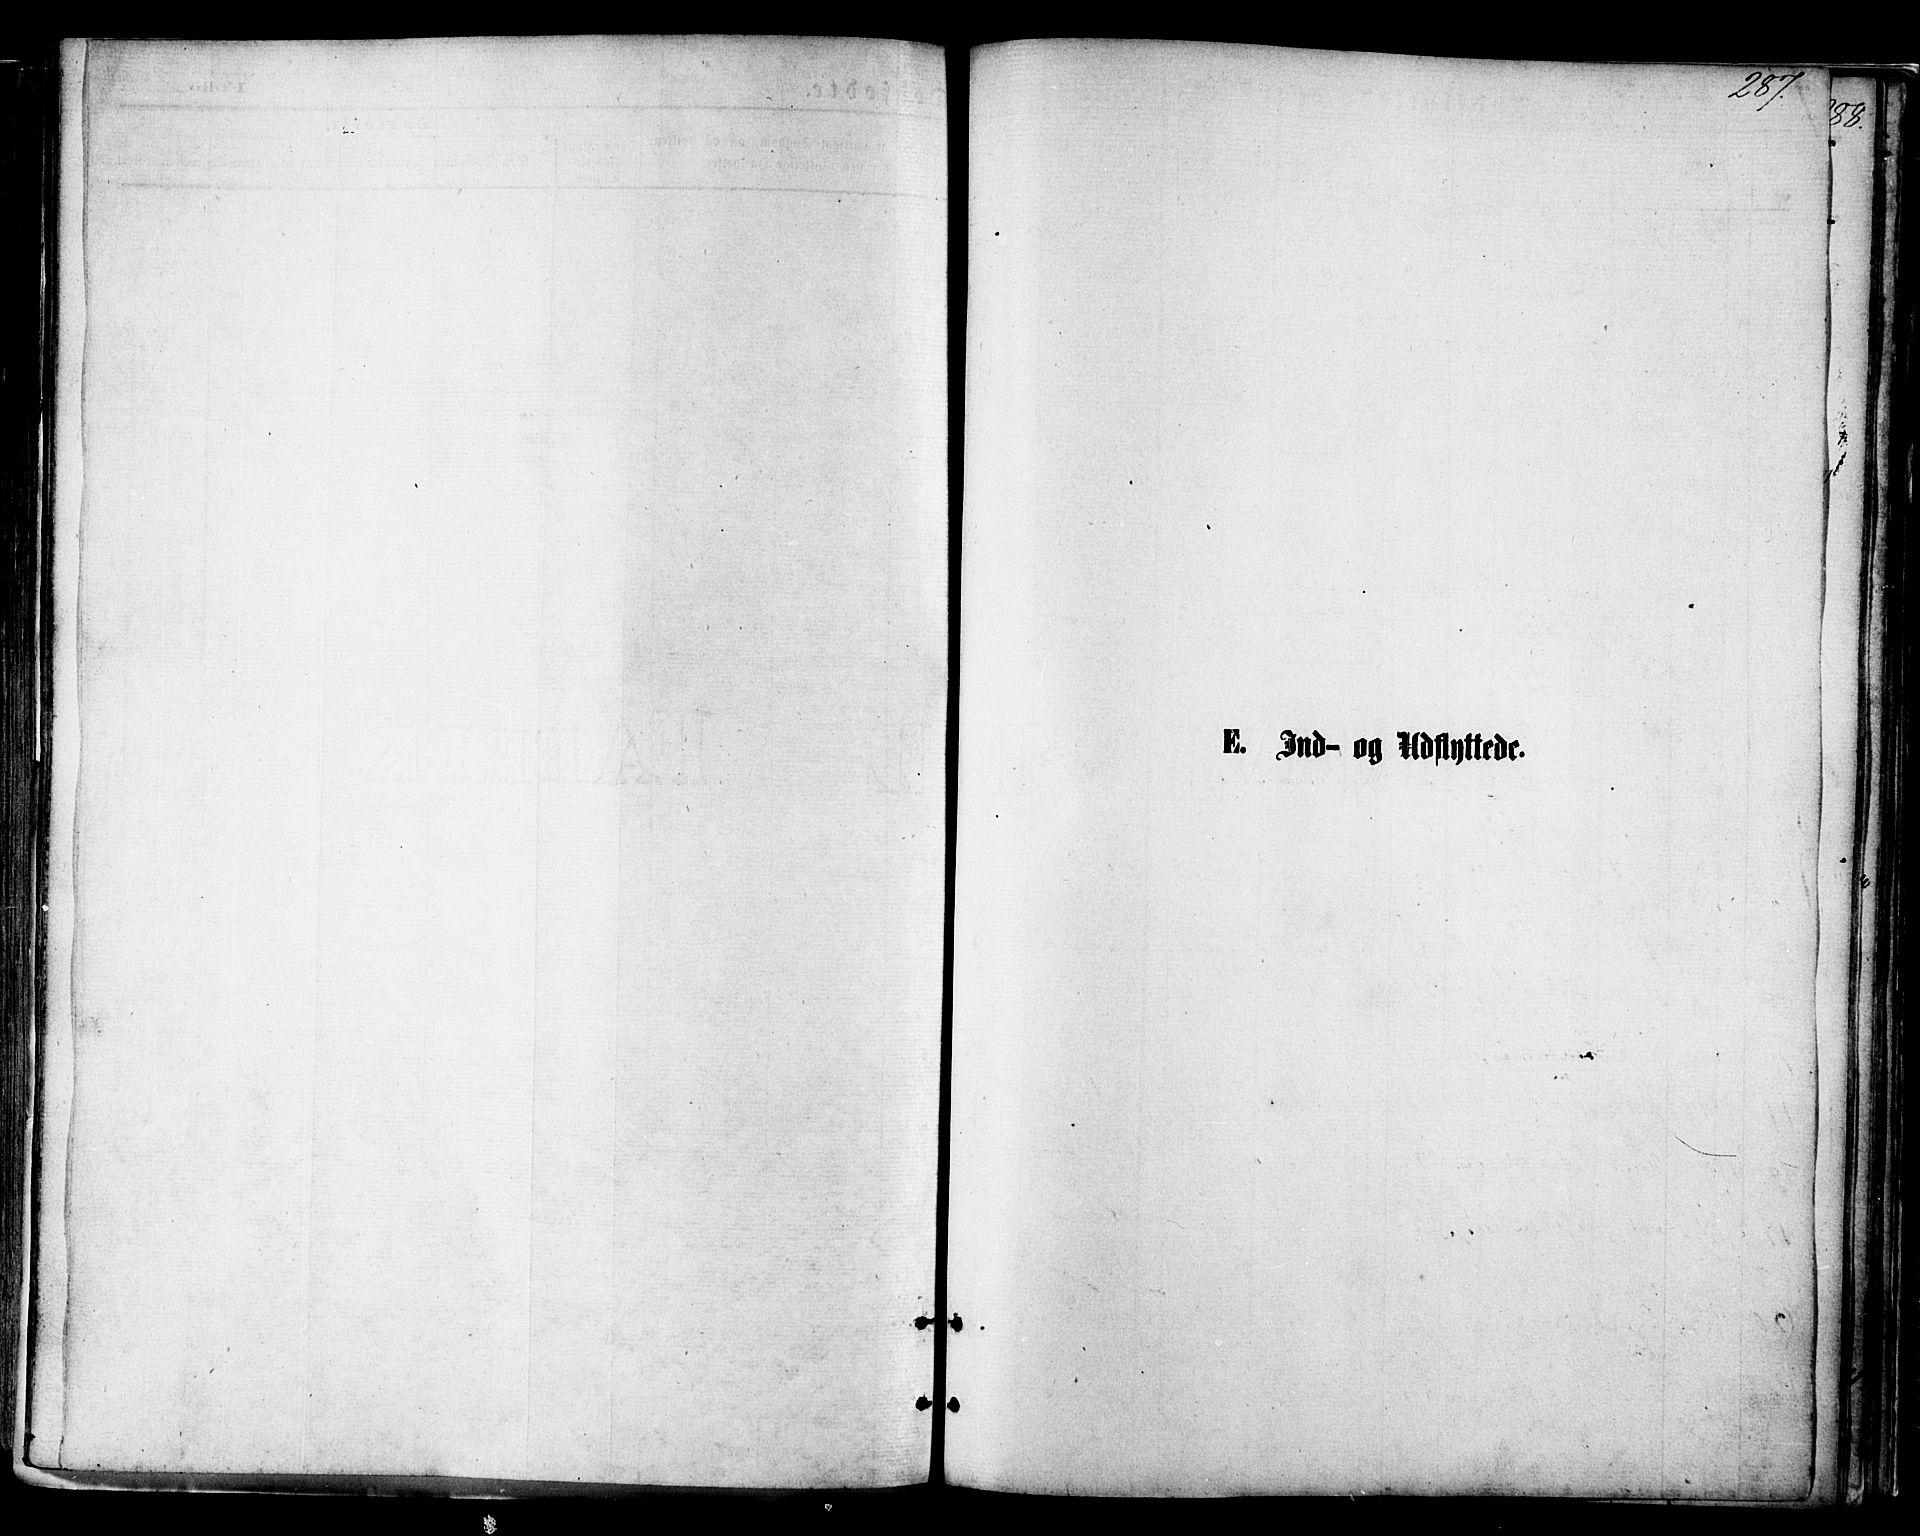 SAT, Ministerialprotokoller, klokkerbøker og fødselsregistre - Nordland, 801/L0009: Ministerialbok nr. 801A09, 1876-1883, s. 287